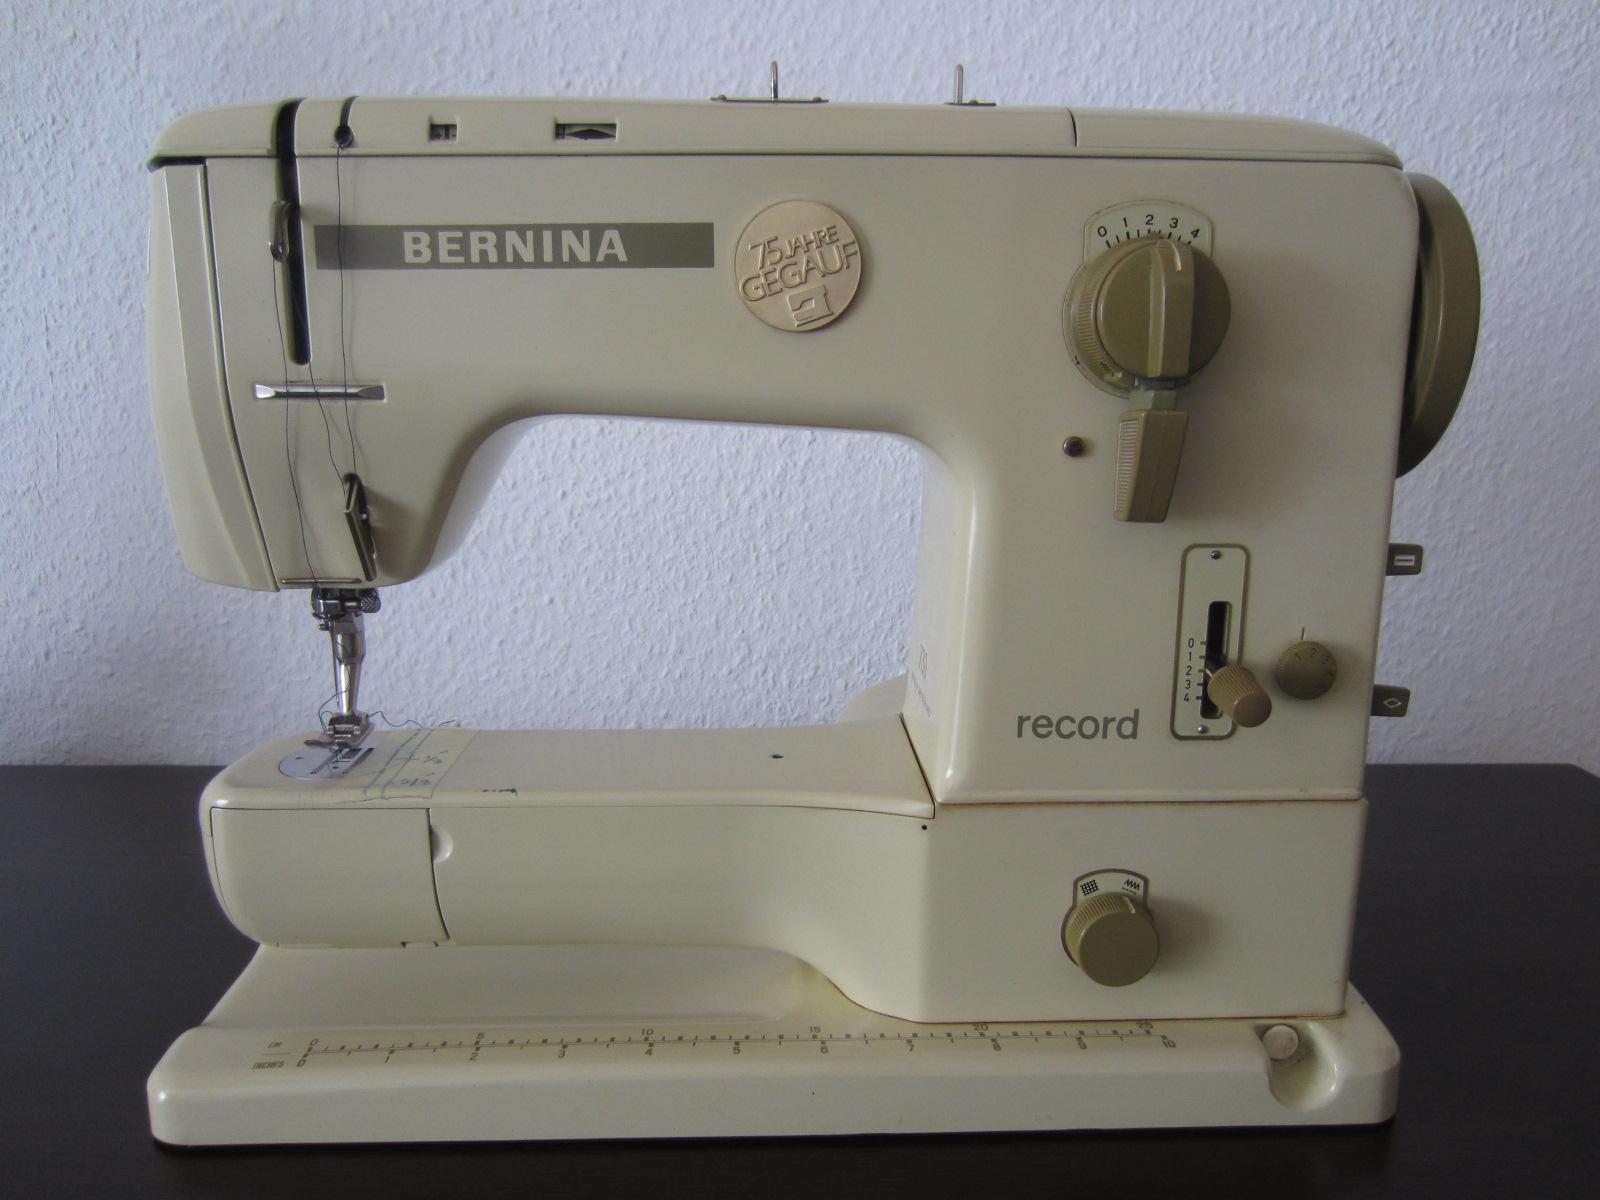 hight resolution of retro tech geneva sewing machine sundays bernina record jpg 1600x1200 used bernina sewing machines sale